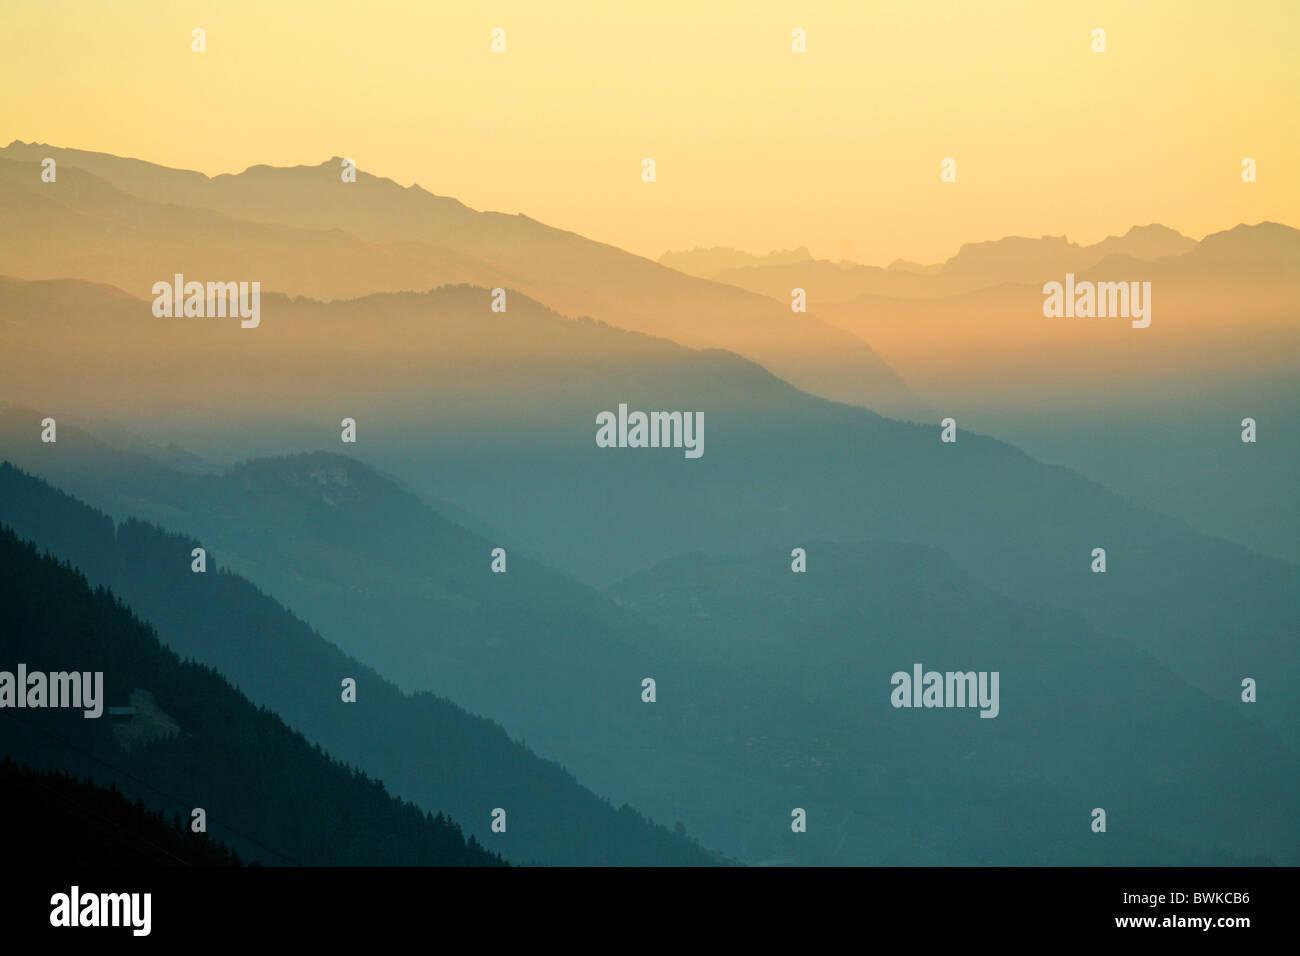 mountain landscape silhouettes outlines fogs smoke mood dusk twilight Alps mountains scenery landscape Dis - Stock Image